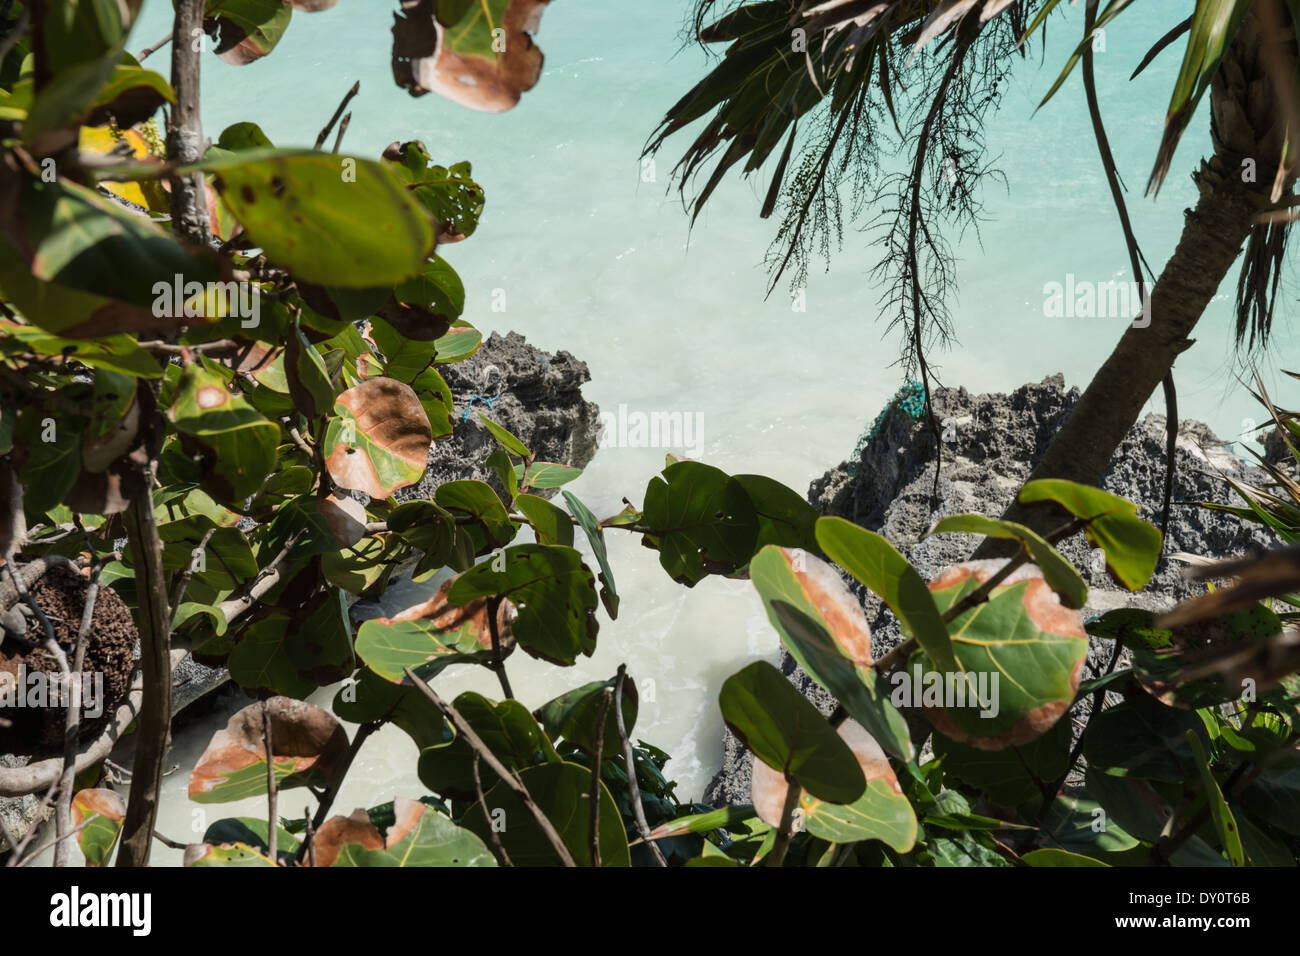 tulum mexico maya ruins - Stock Image